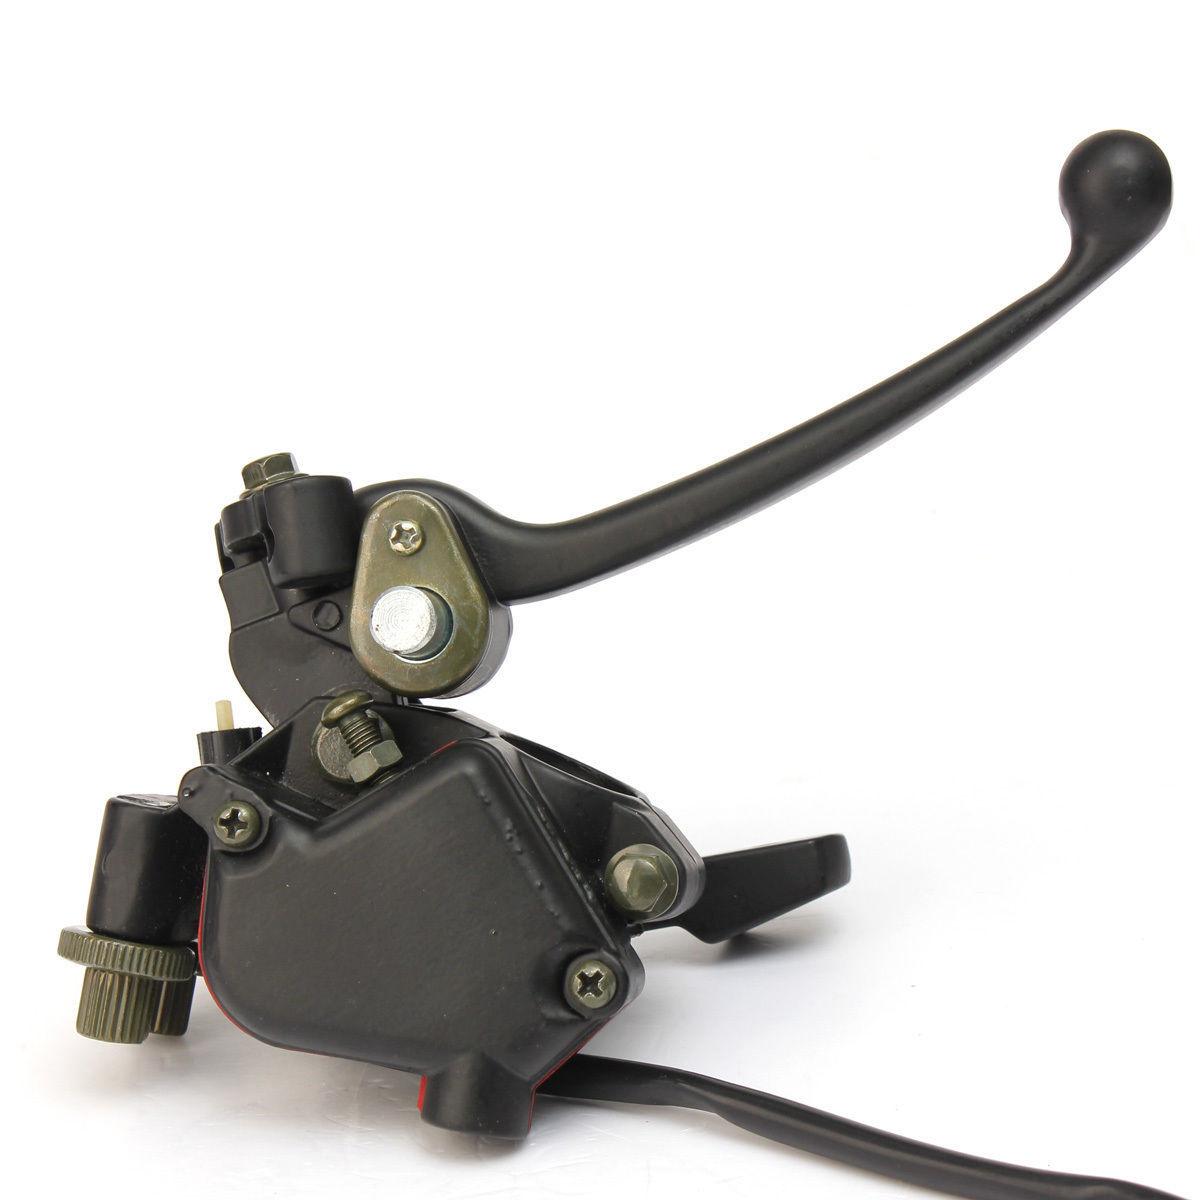 Atv Throttle Lever : China atv quad wheeler cc throttle handle